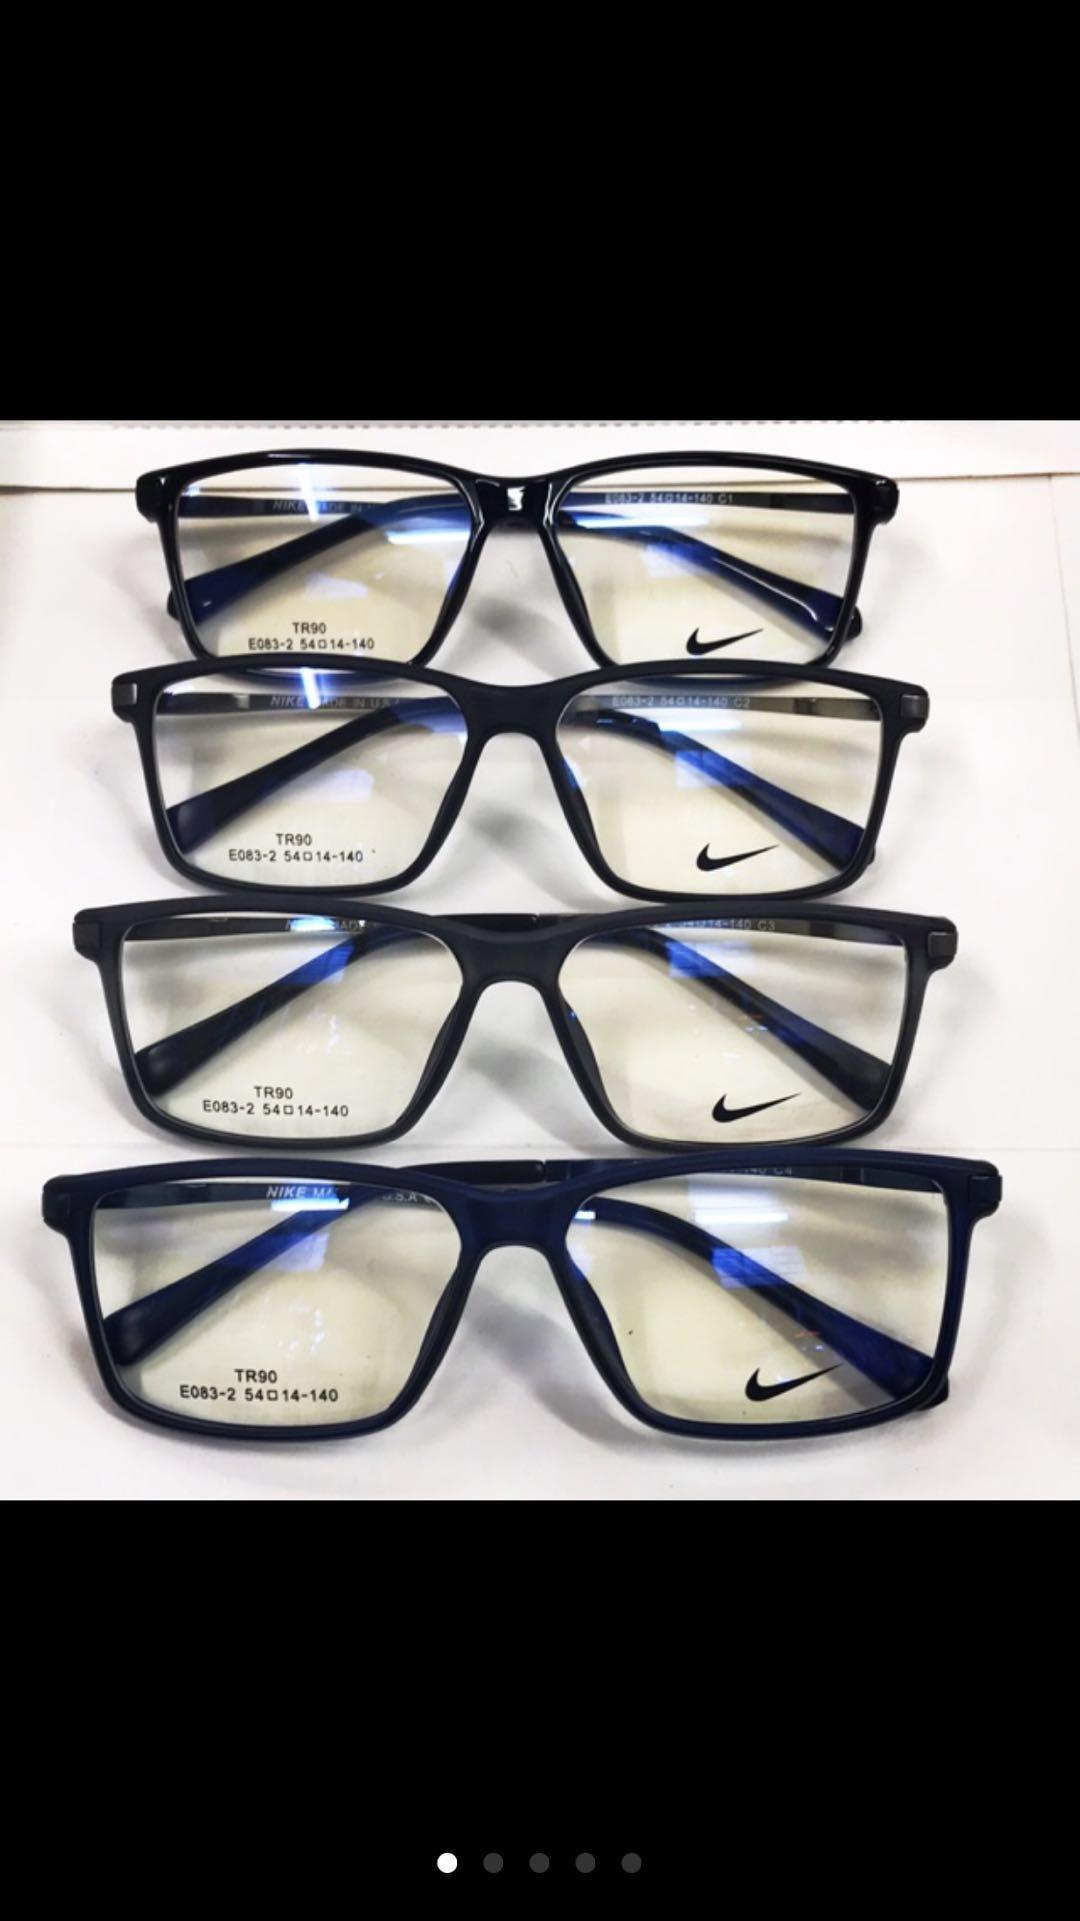 b8531268dc Unisex Sunglasses for sale - Simple Sunglasses online brands